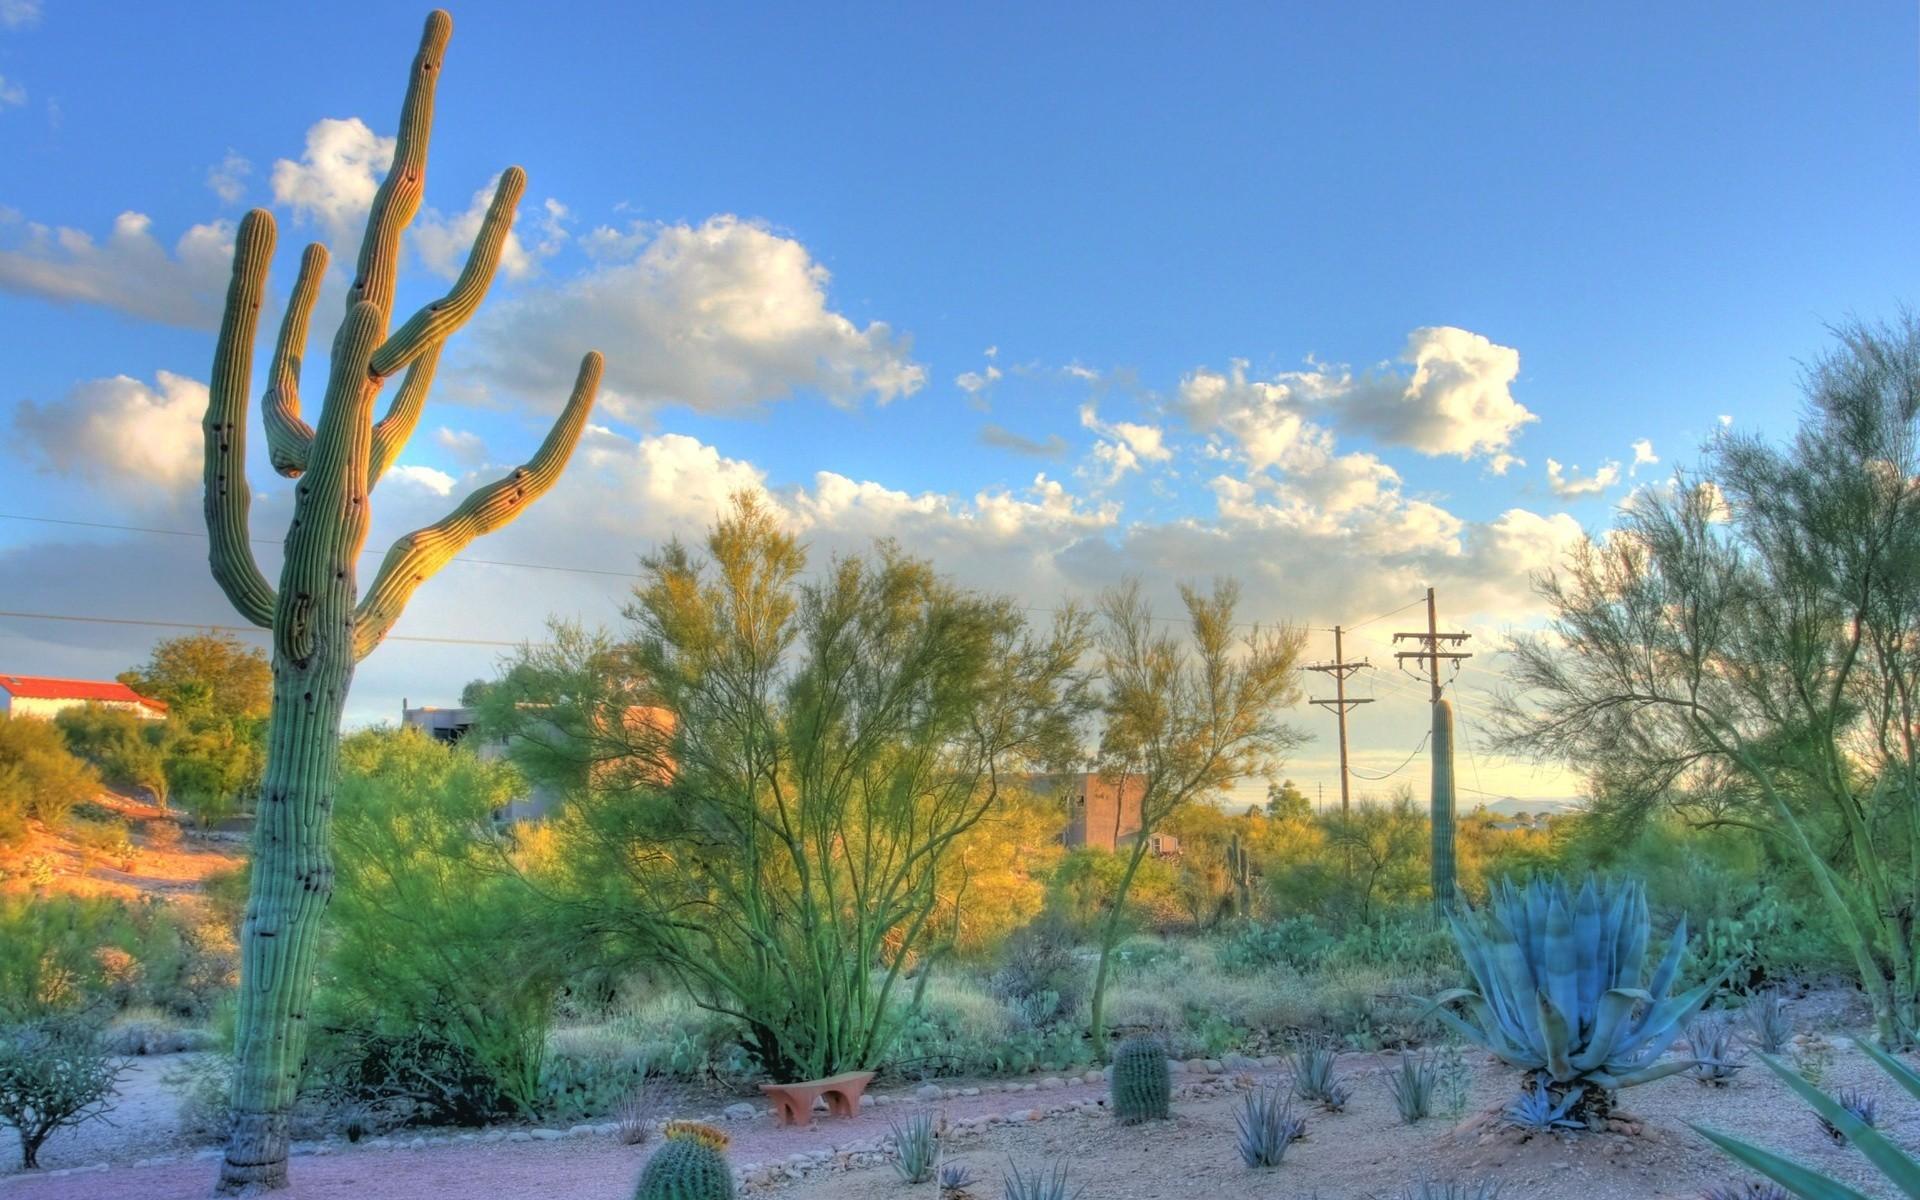 … Desert Arizona Wallpaper Desert, Arizona, Cactus, Tucson .